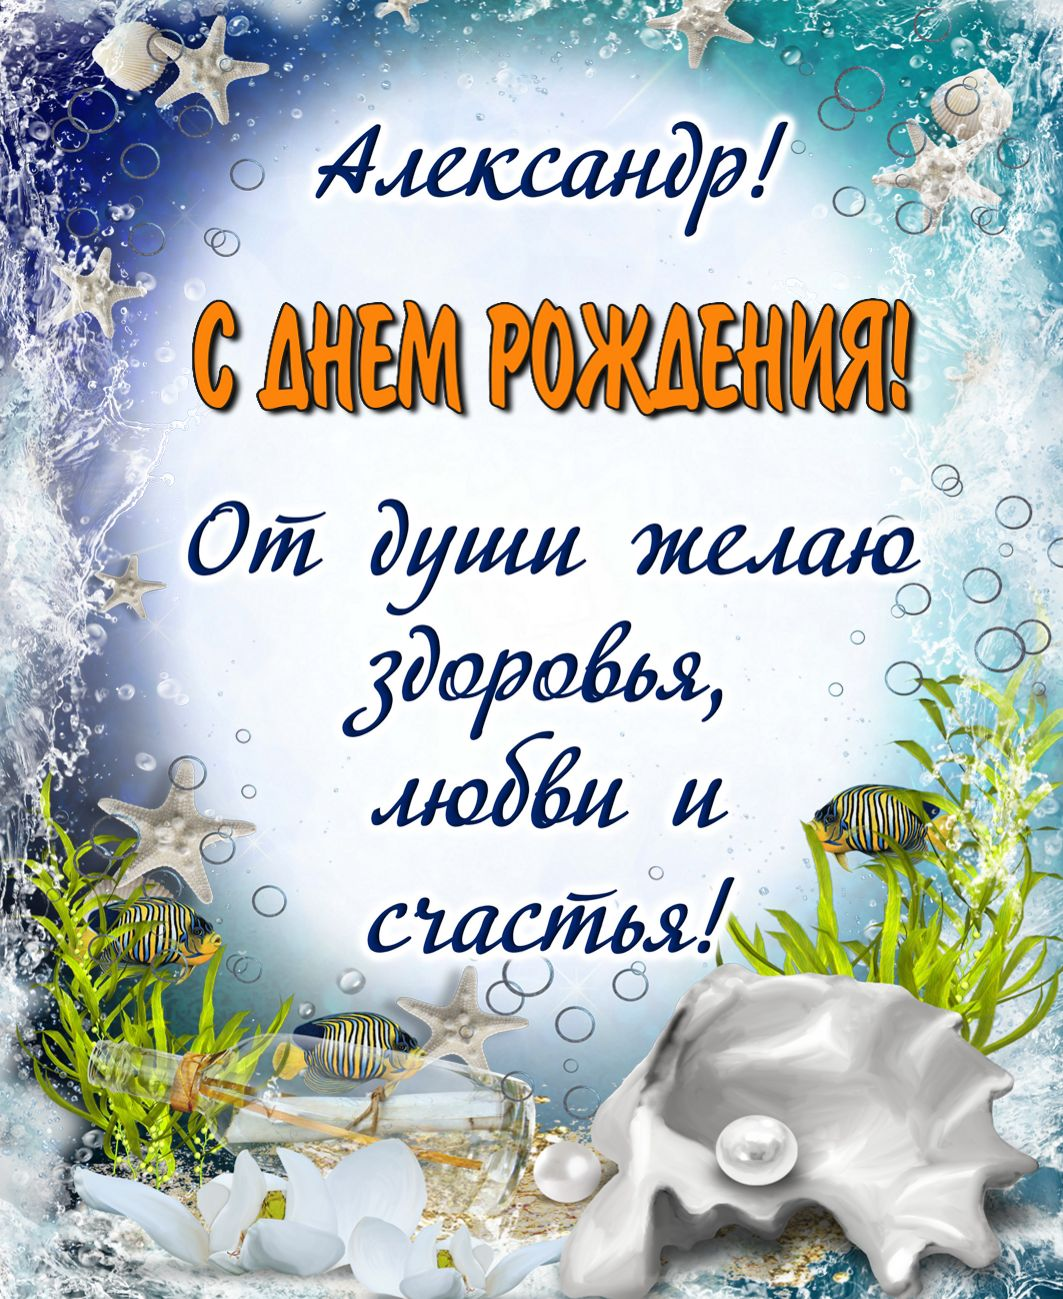 Поздравление Александру на фоне морского дна